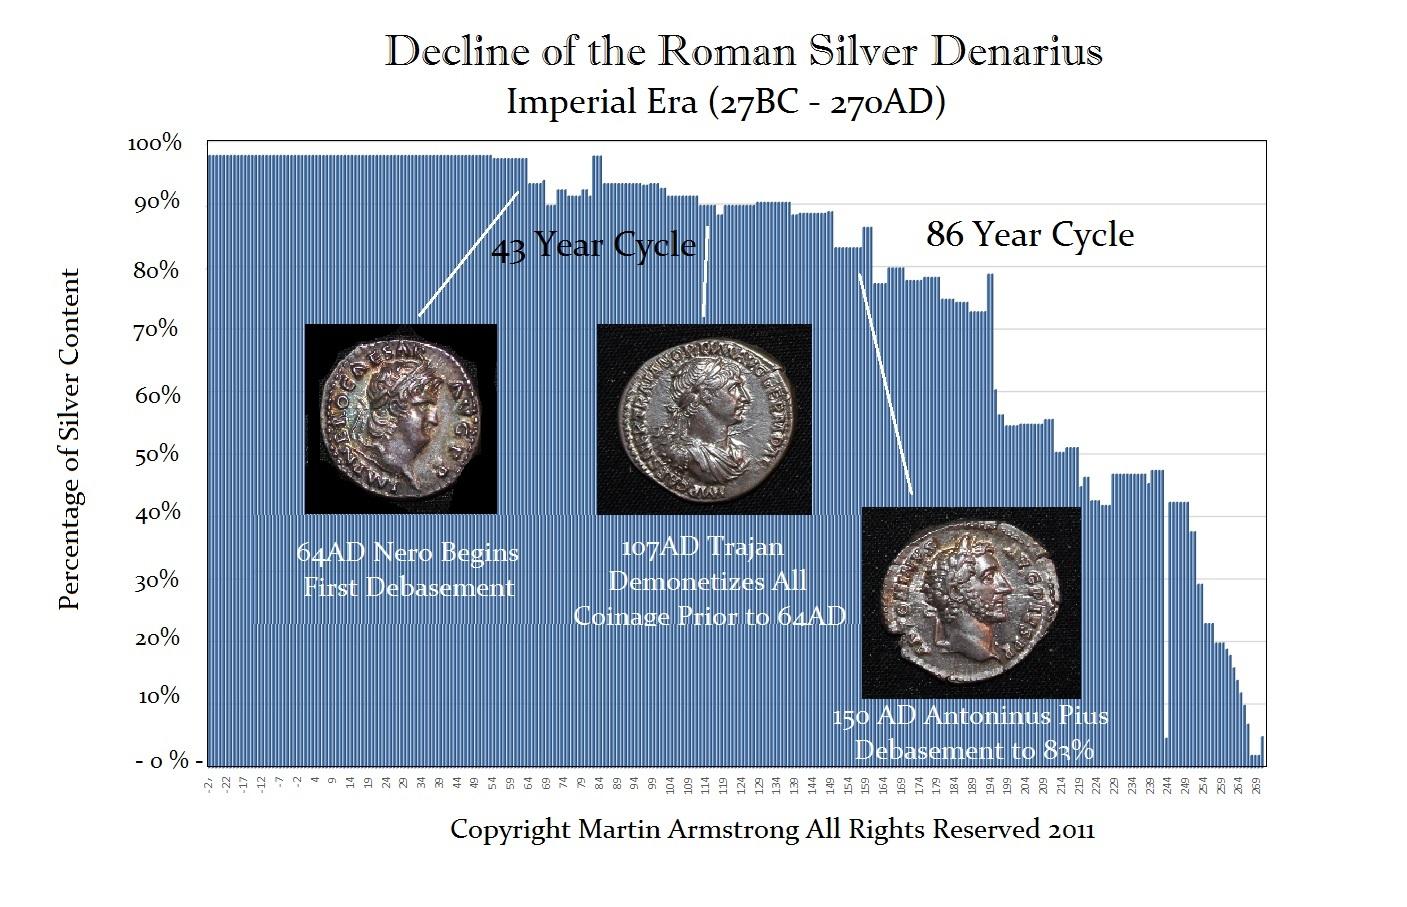 Romane Imperial Debasement